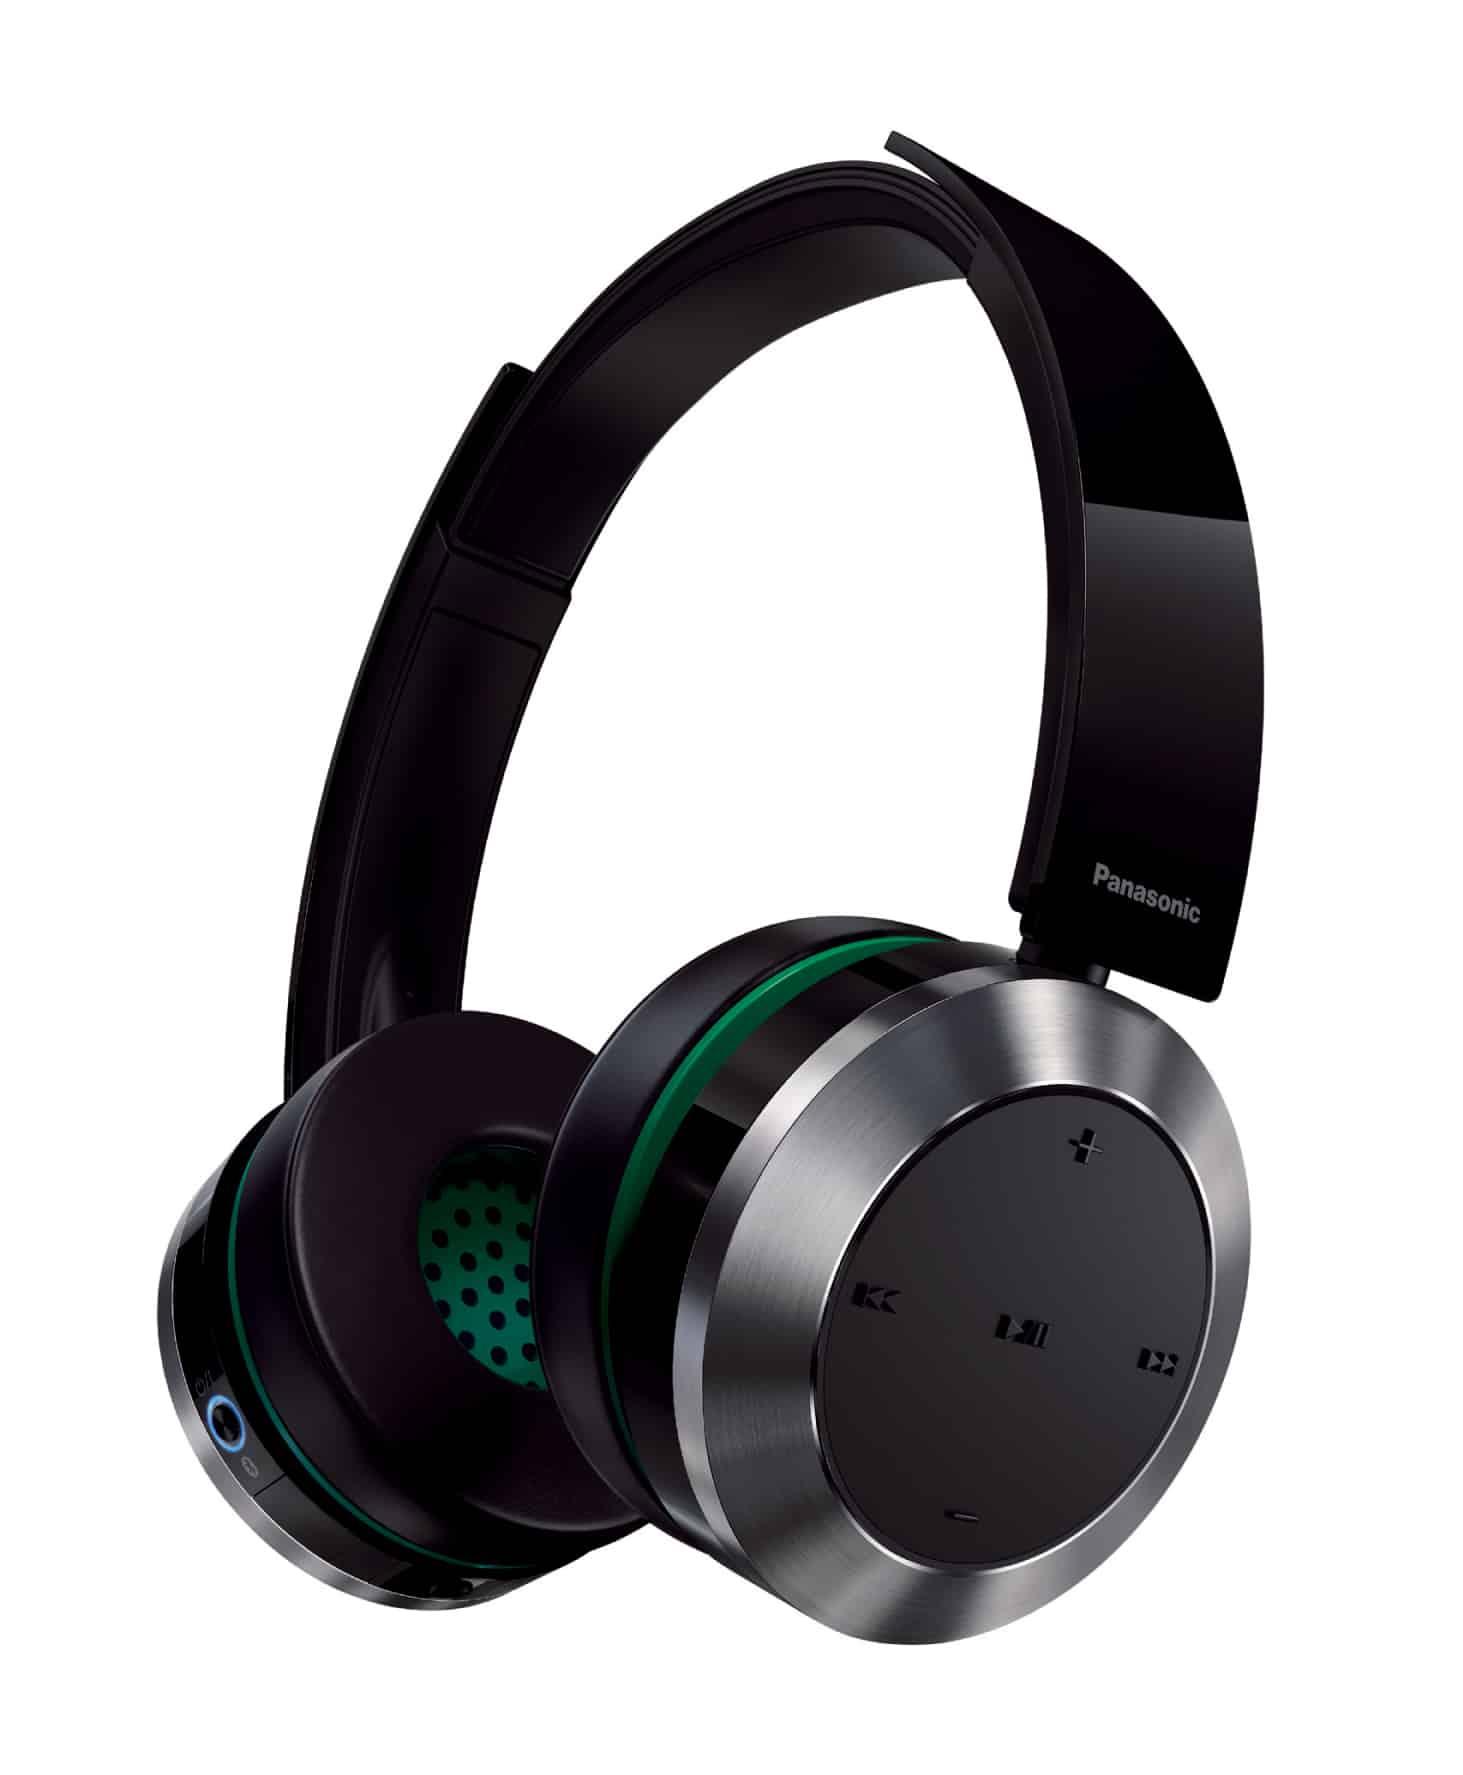 panasonic BTD10 headphone